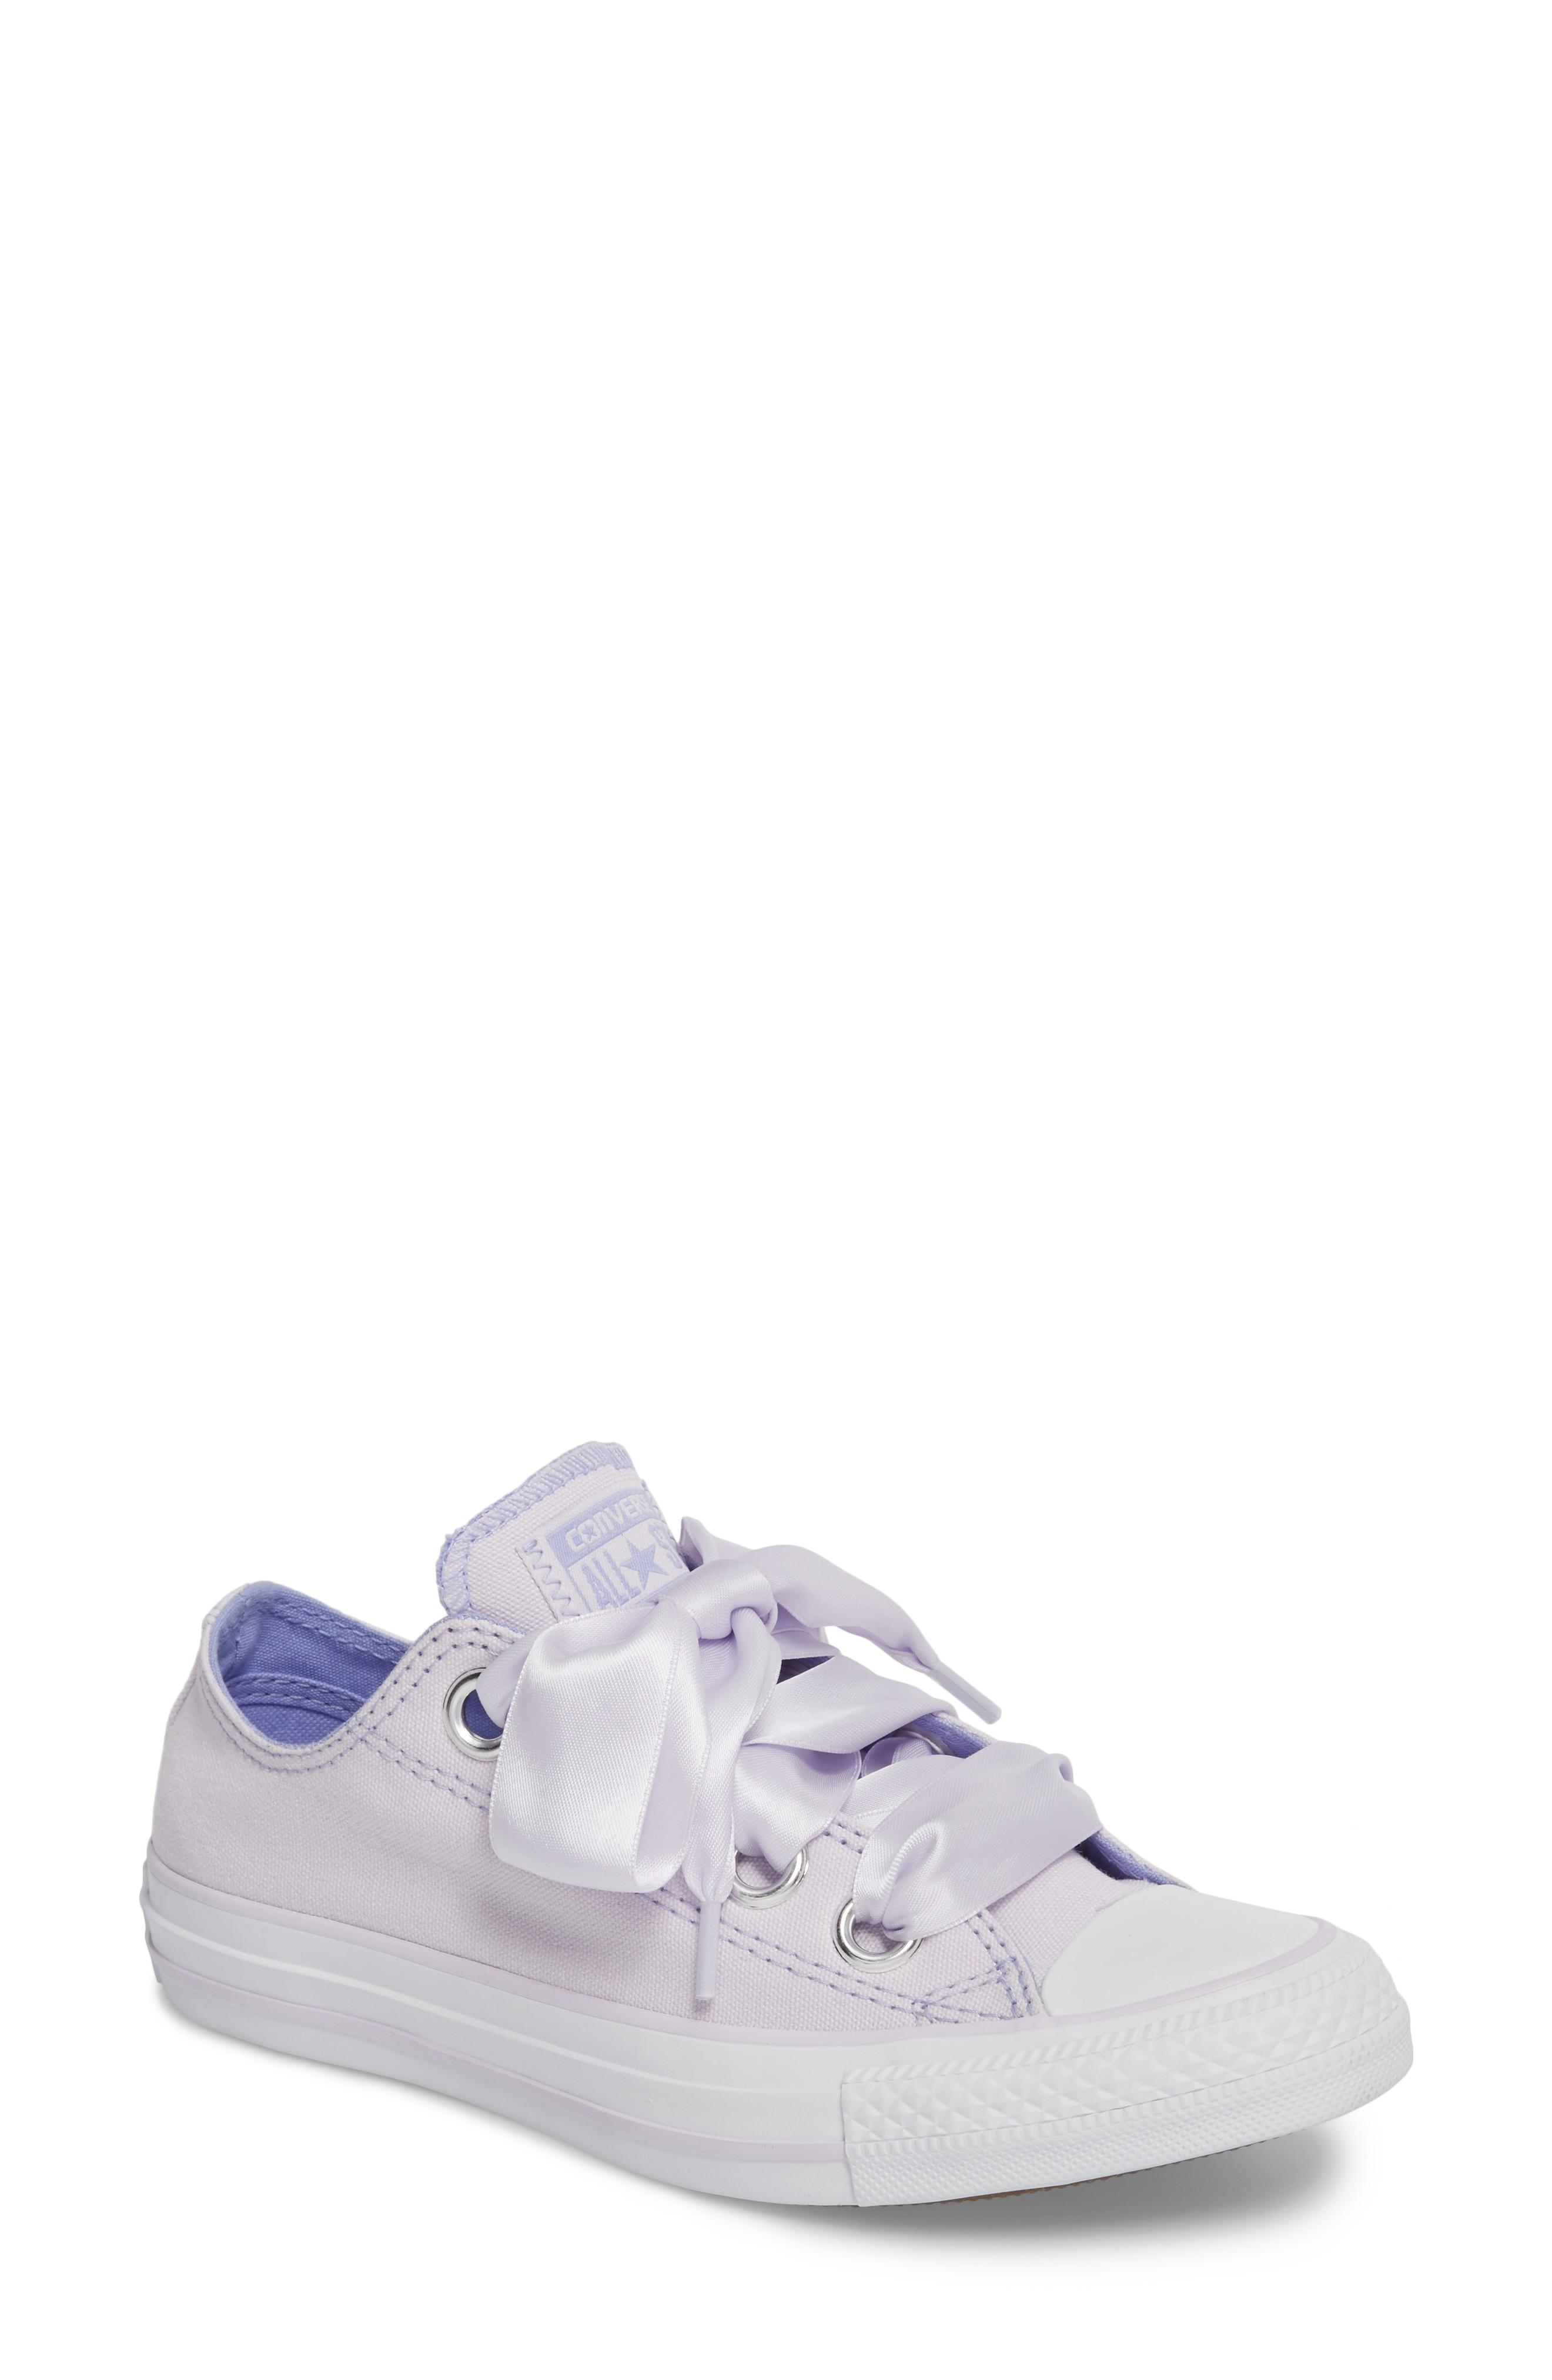 deba746fdcafb3 Converse Chuck Taylor All Star Big Eyelet Ox Sneaker In Barely Grape ...